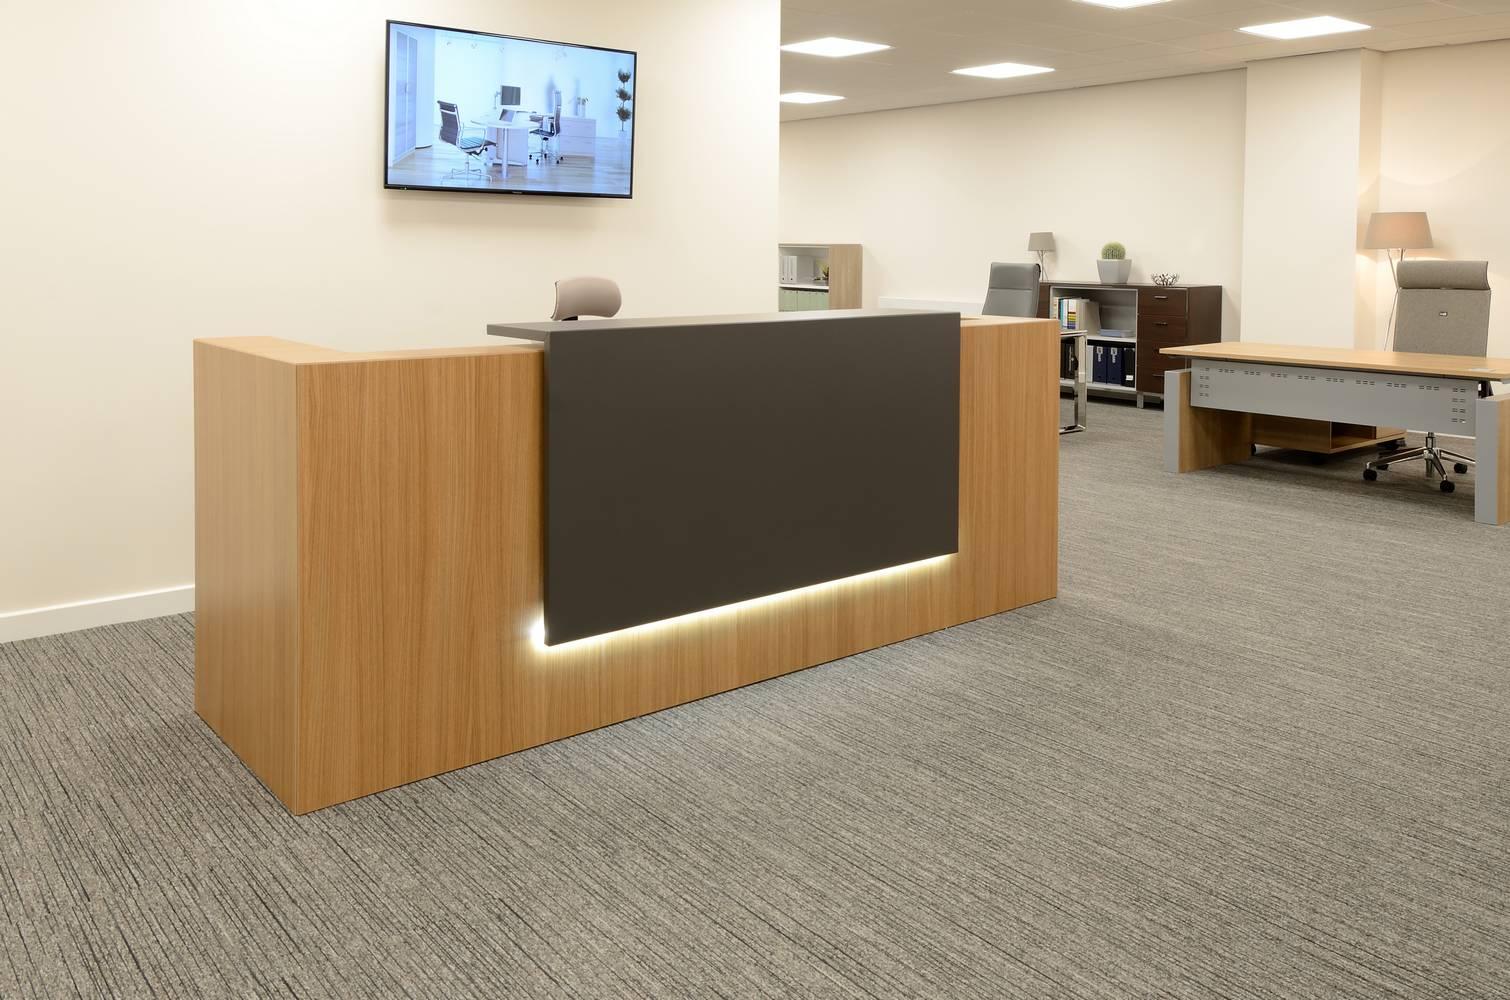 Quality Office Furniture Showroom Uses Burmatex® Tandem